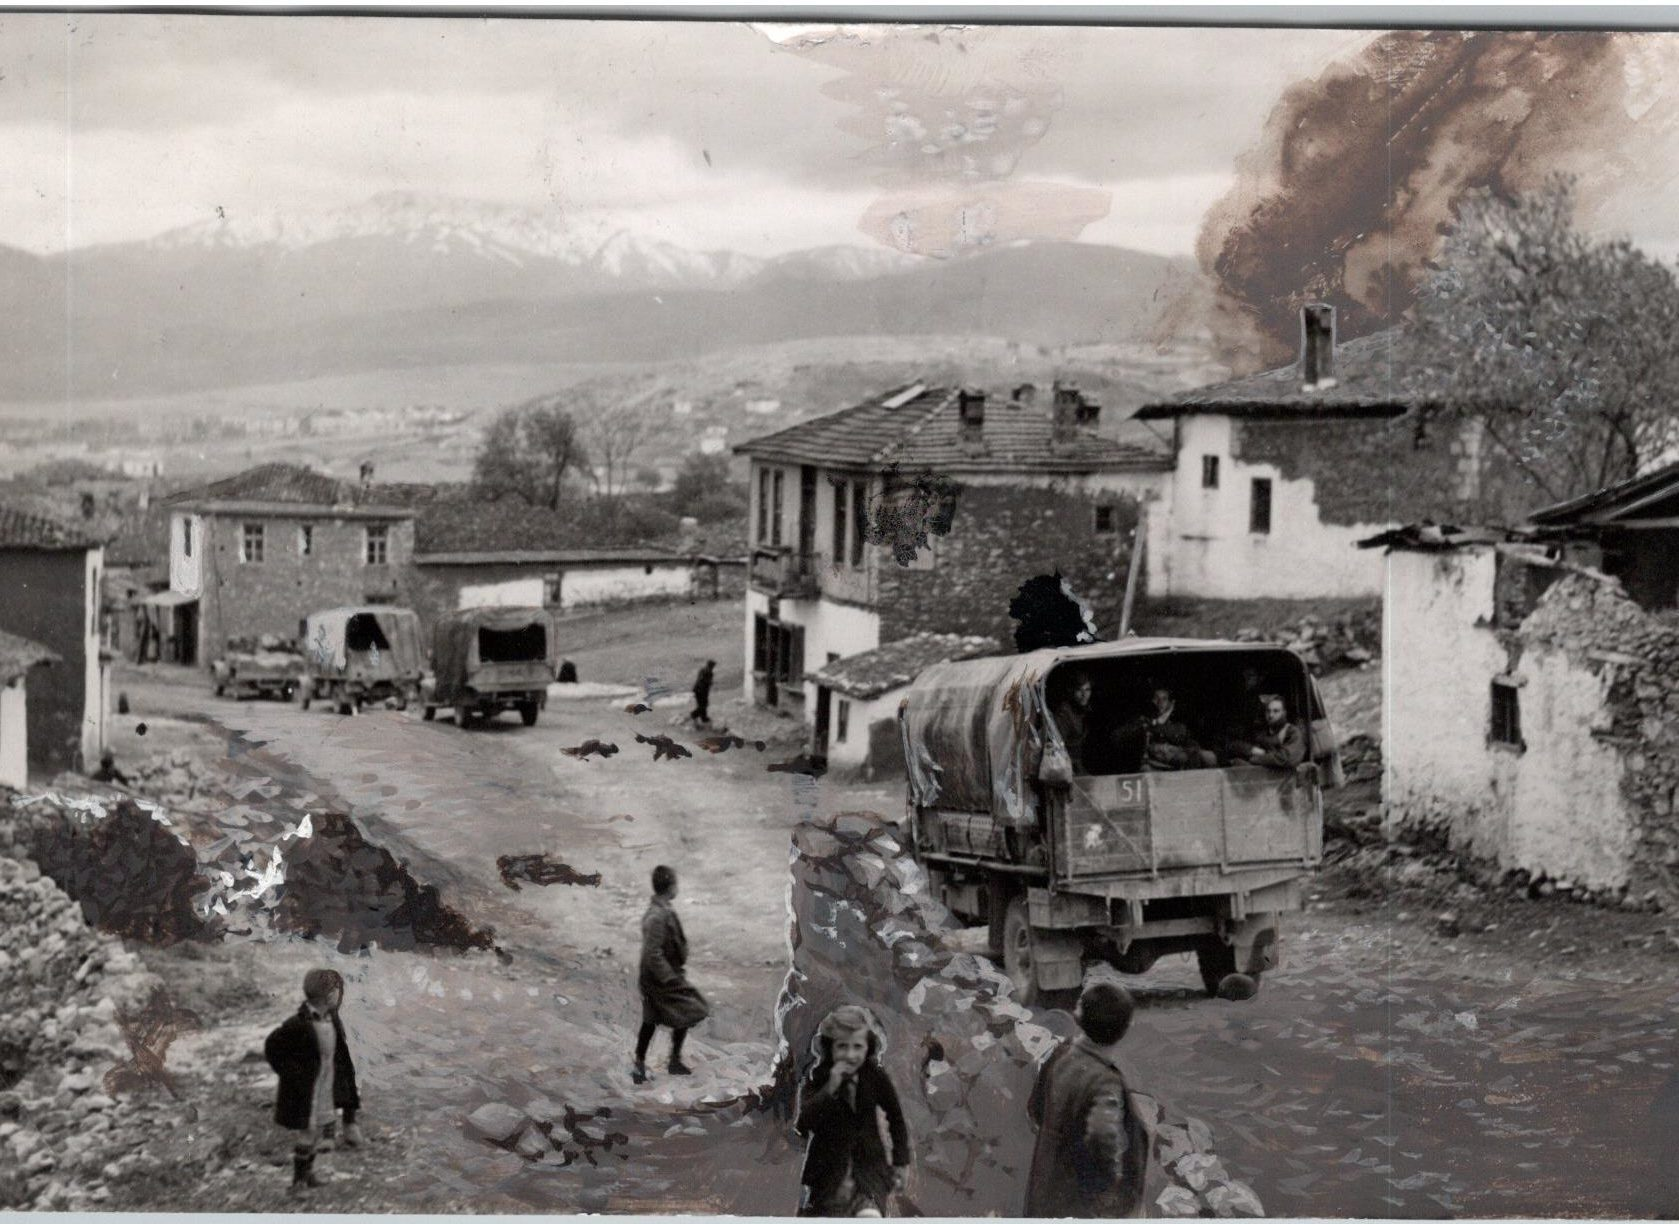 An Australian Convoy passing through a war-scarred Greek village.